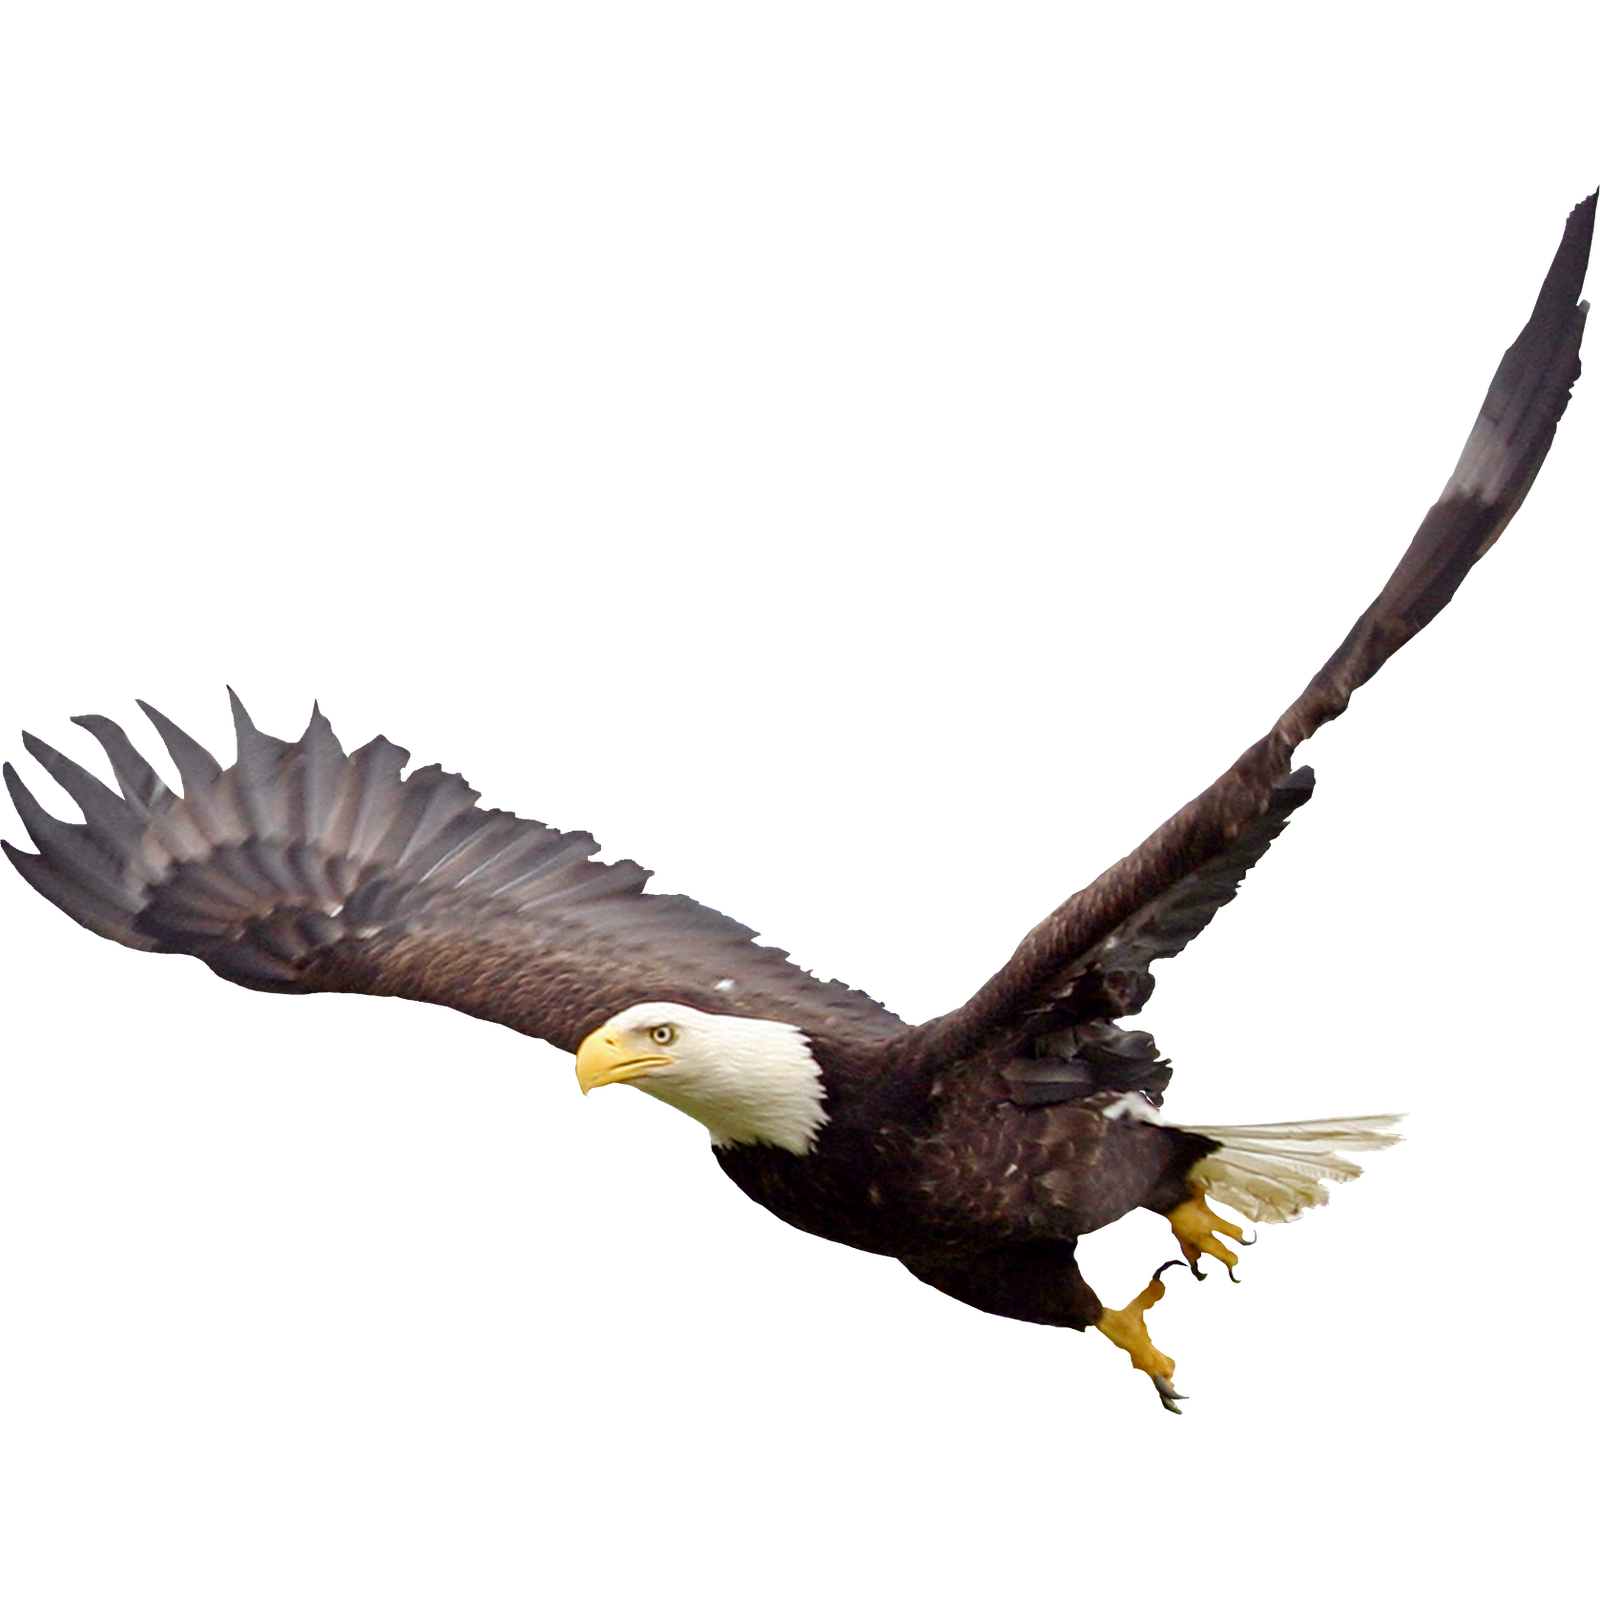 Eagle clipart pencil. Bald soaring png images